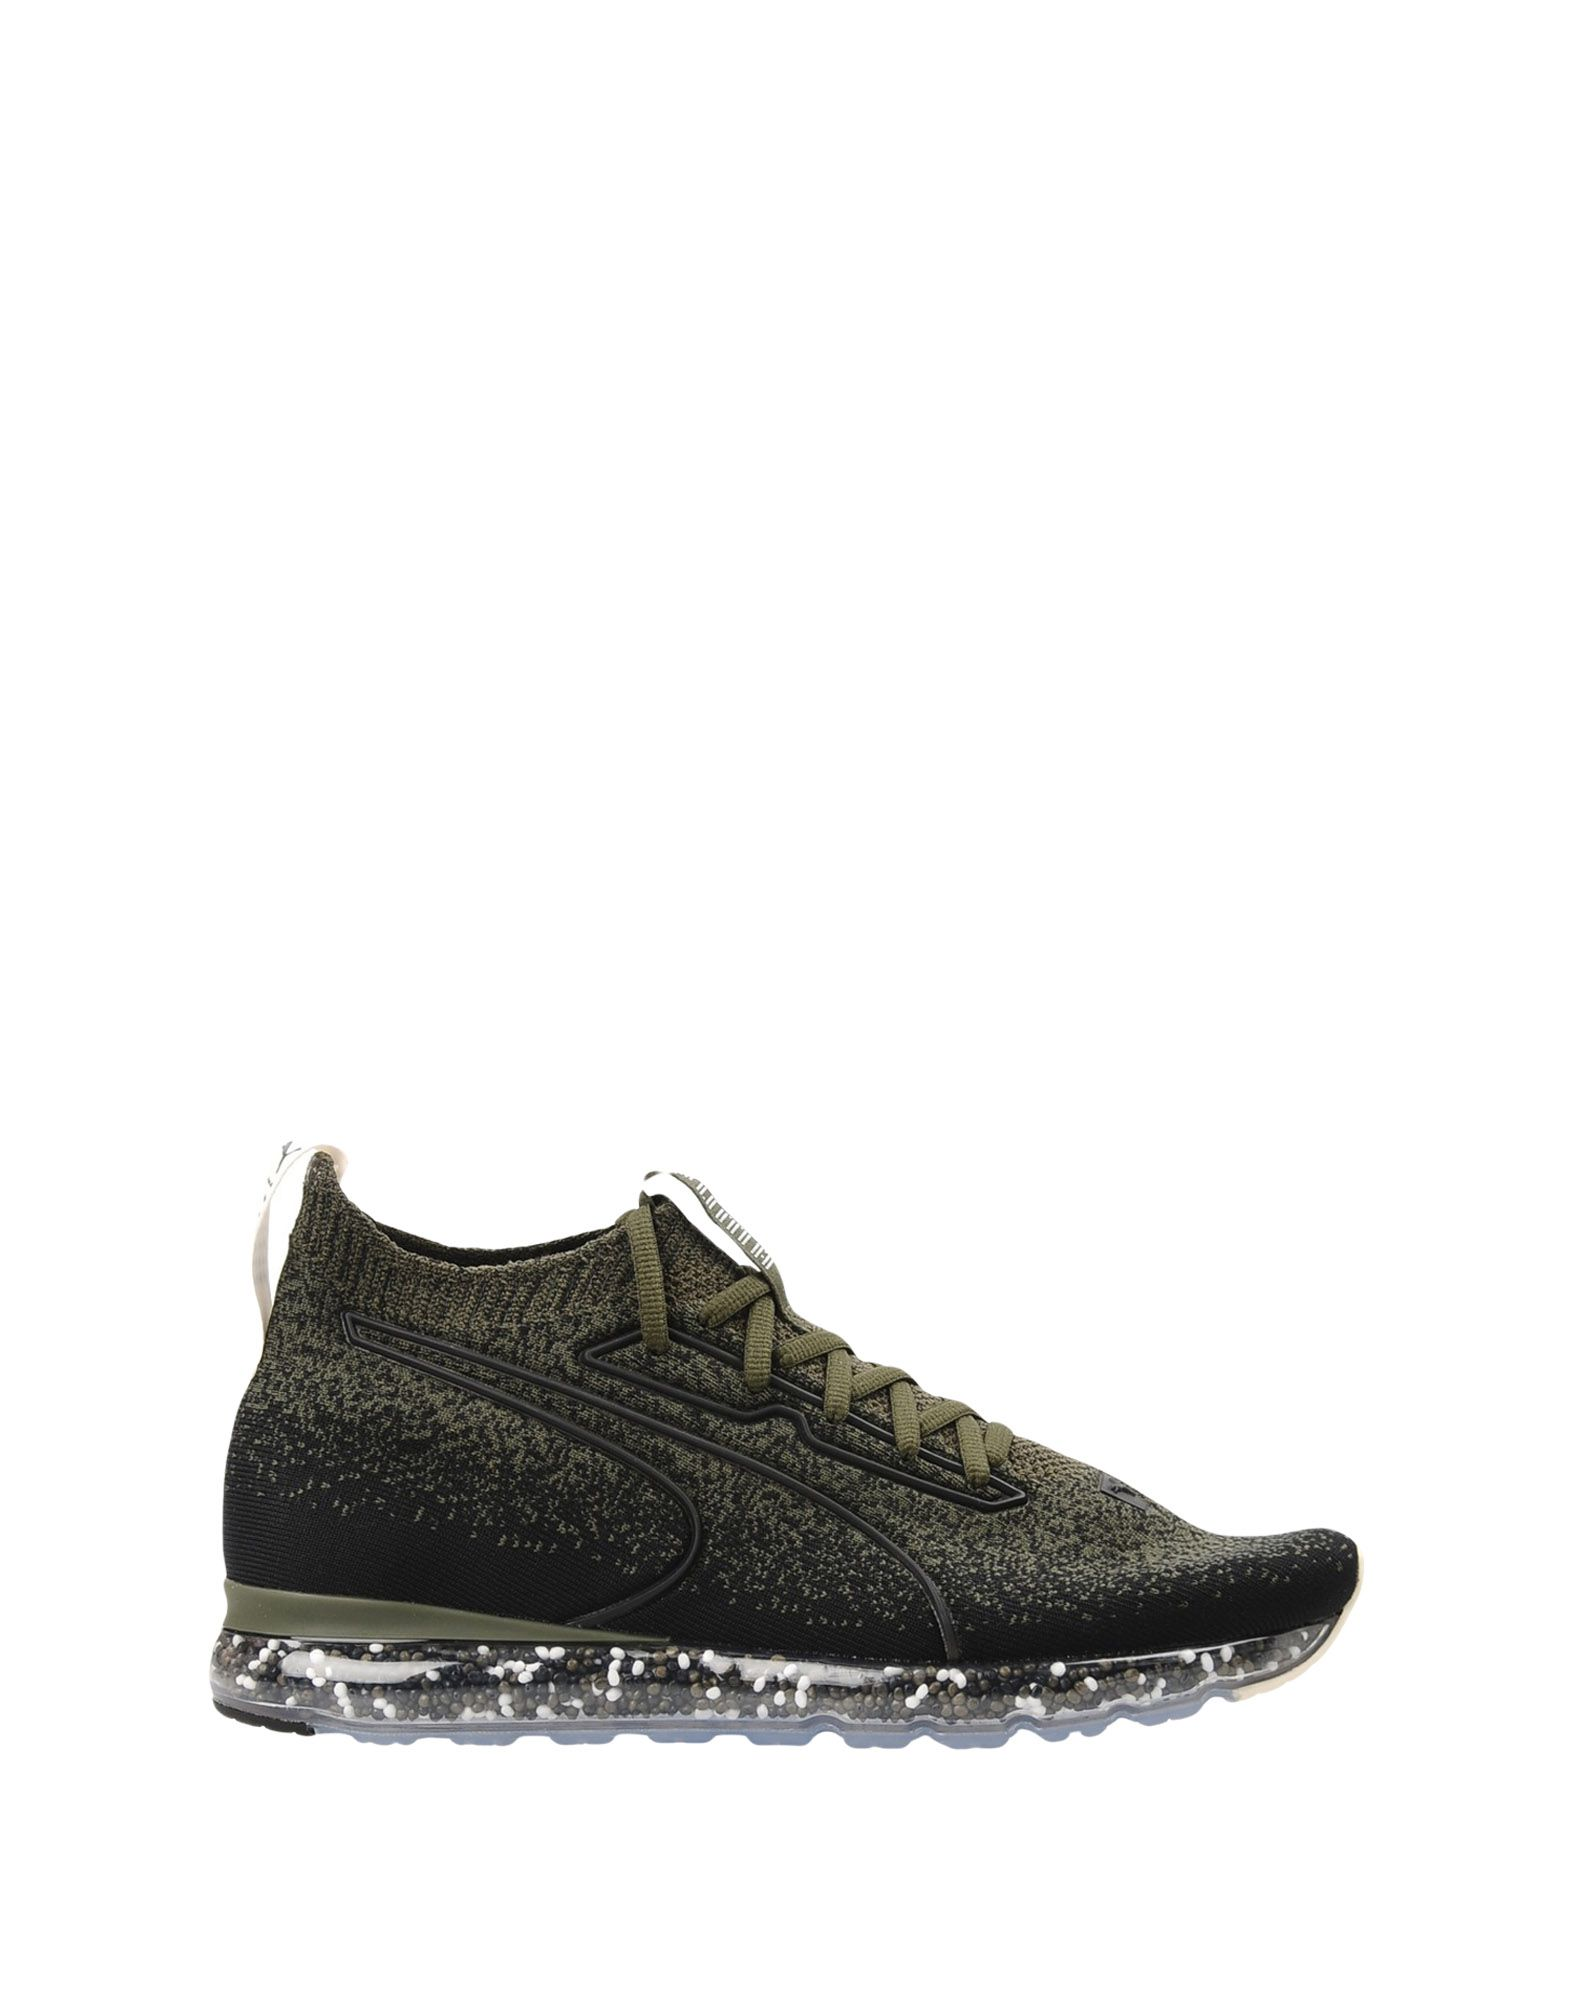 Puma 11444618DT Jamming Evoknit  11444618DT Puma Gute Qualität beliebte Schuhe 8b62d2